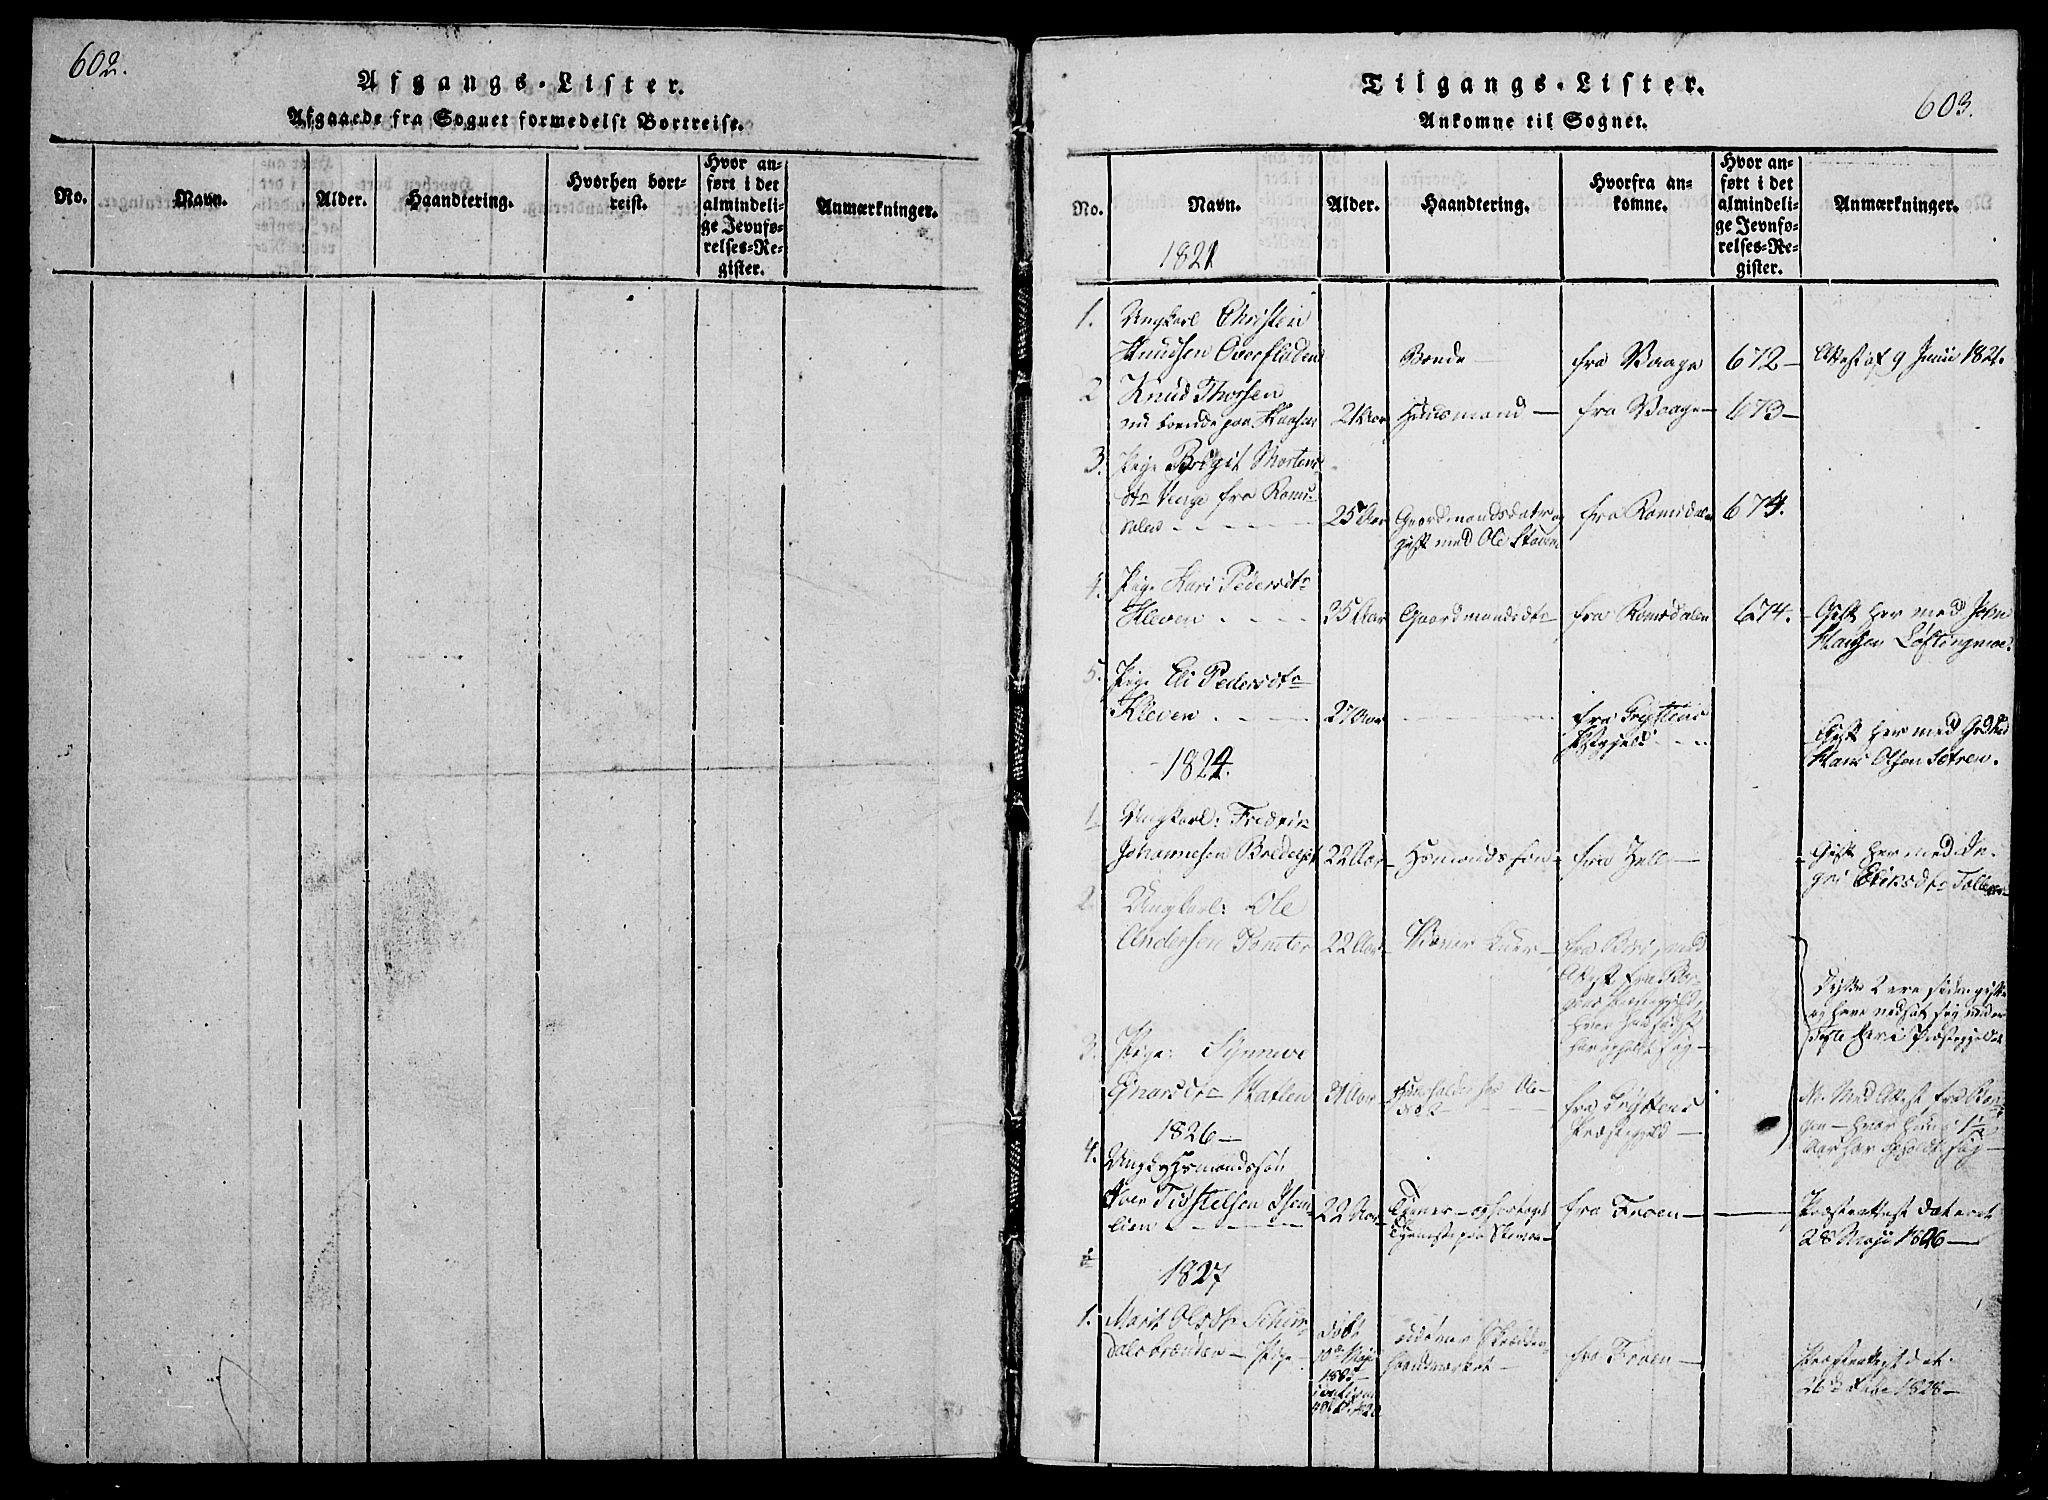 SAH, Lesja prestekontor, Ministerialbok nr. 4, 1820-1829, s. 602-603